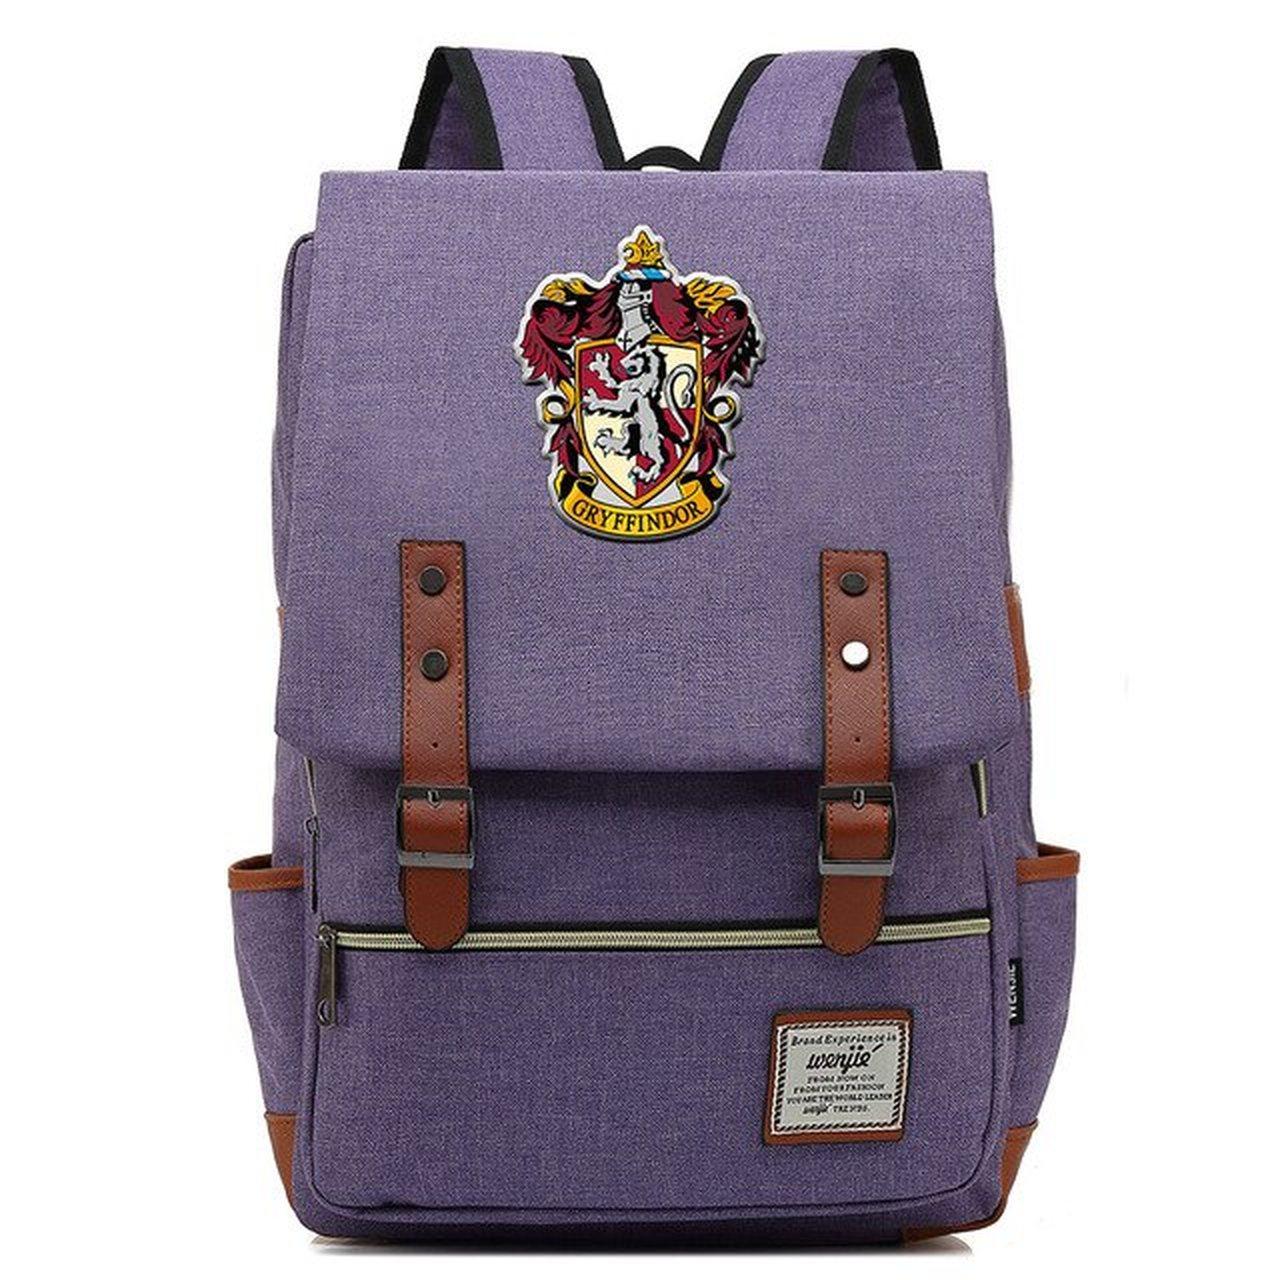 Mochila Hogwarts Casa Grifinória: Harry Potter (Roxo) - MKP